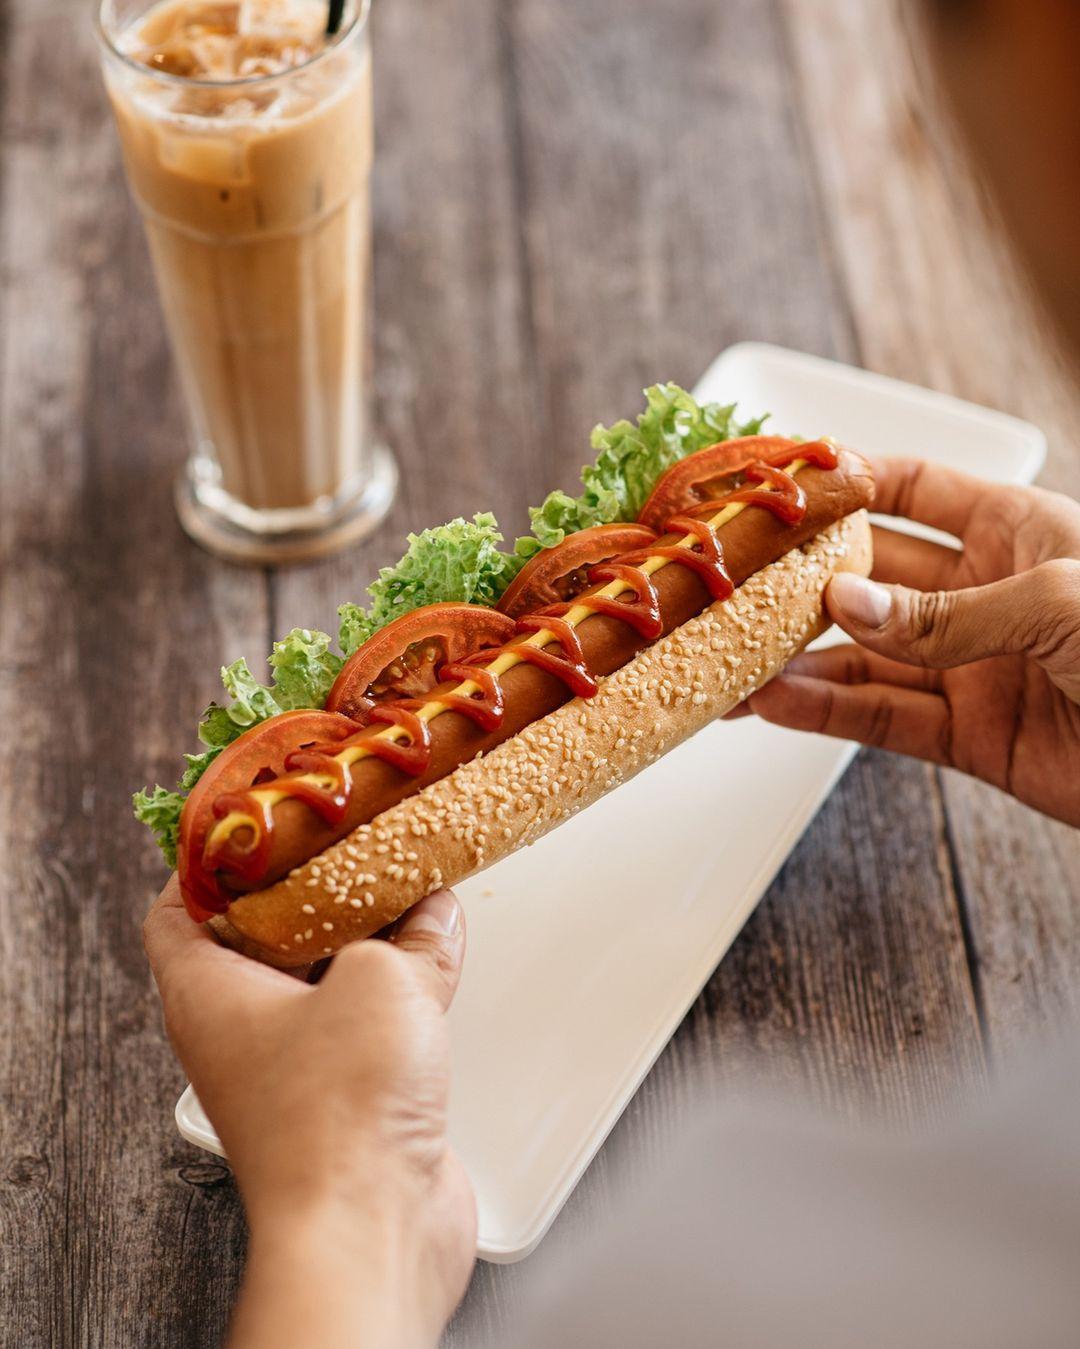 tsui wah jumbo hotdog